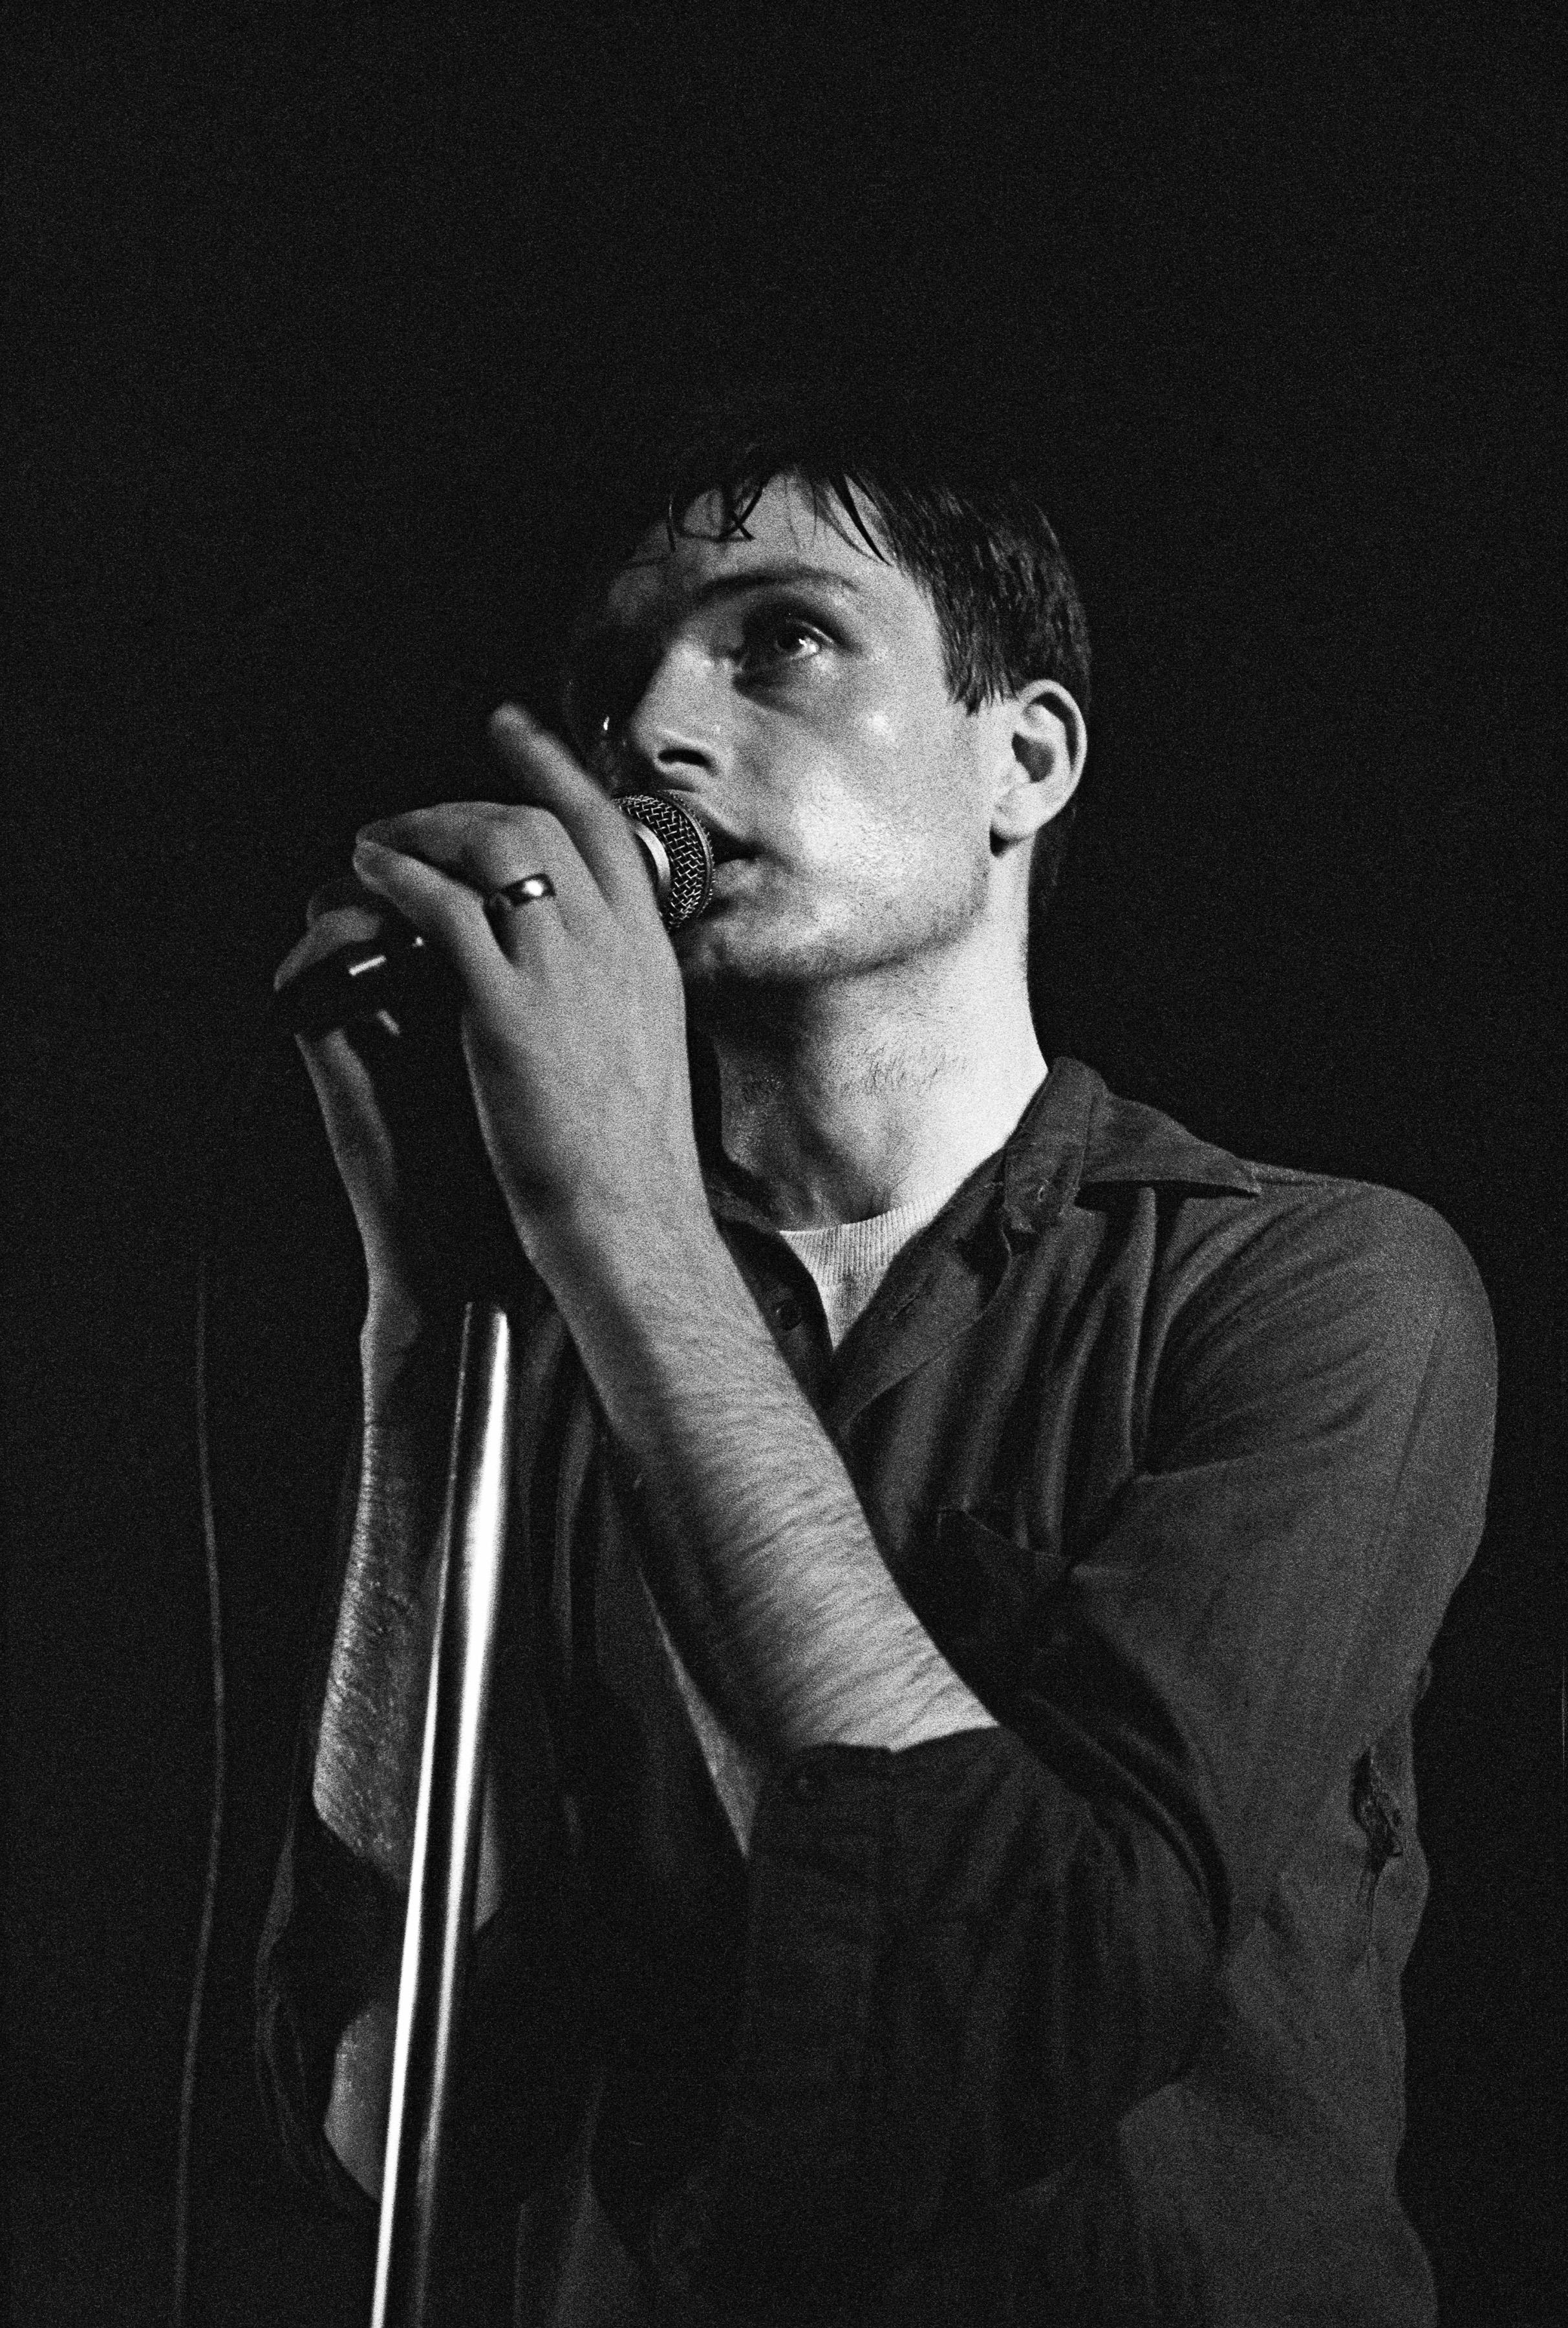 Ian Curtis joy division